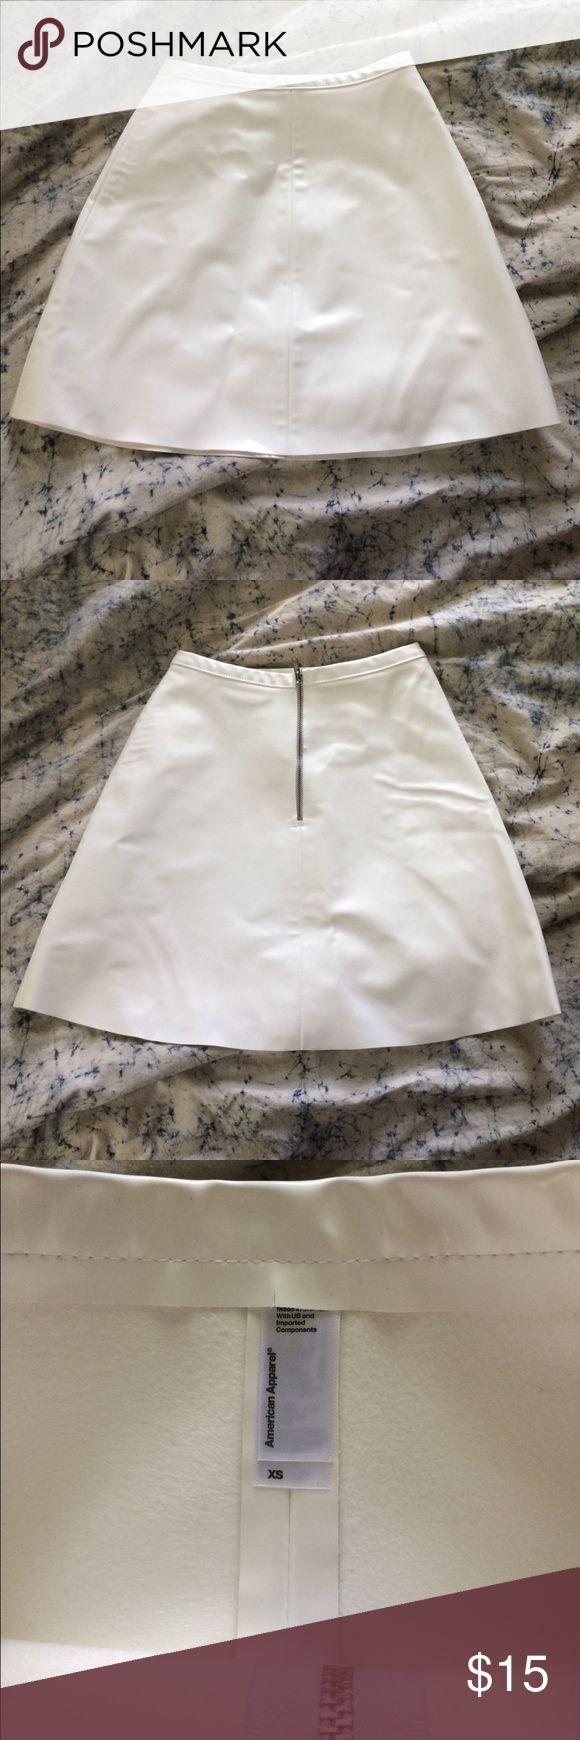 American apparel vintage vinyl skirt Never worn! American Apparel Skirts Mini